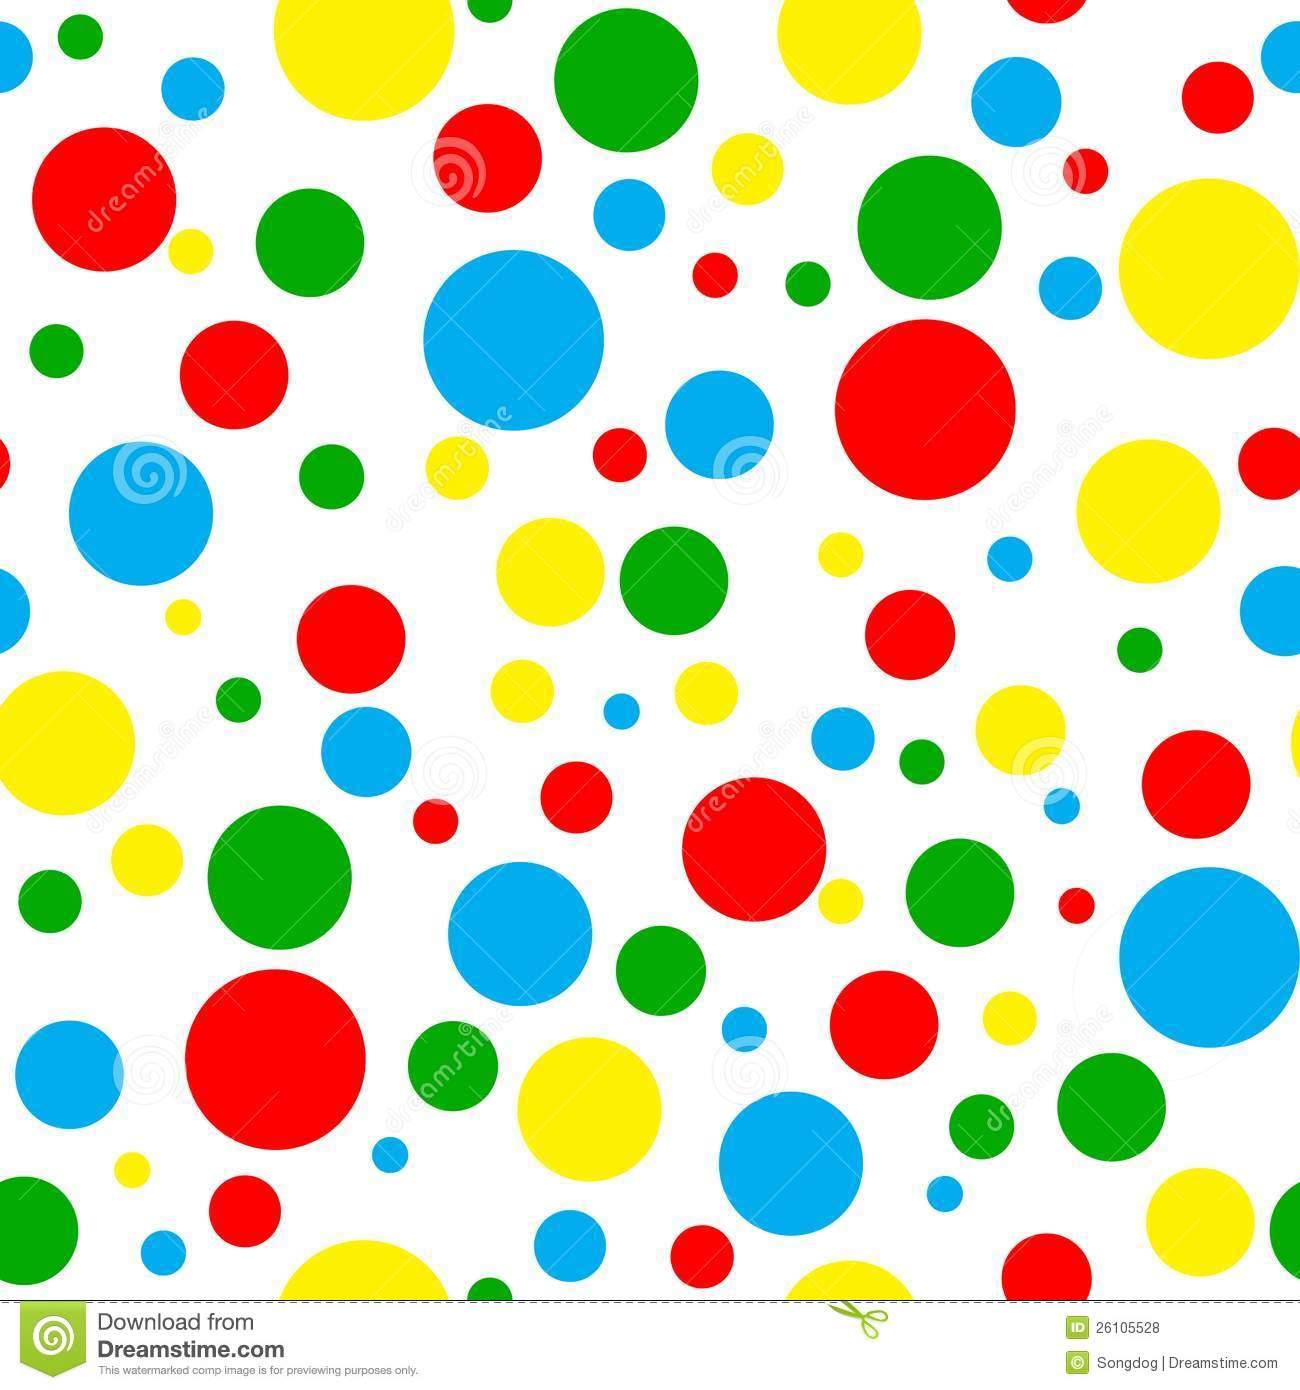 Polka dot clipart free.